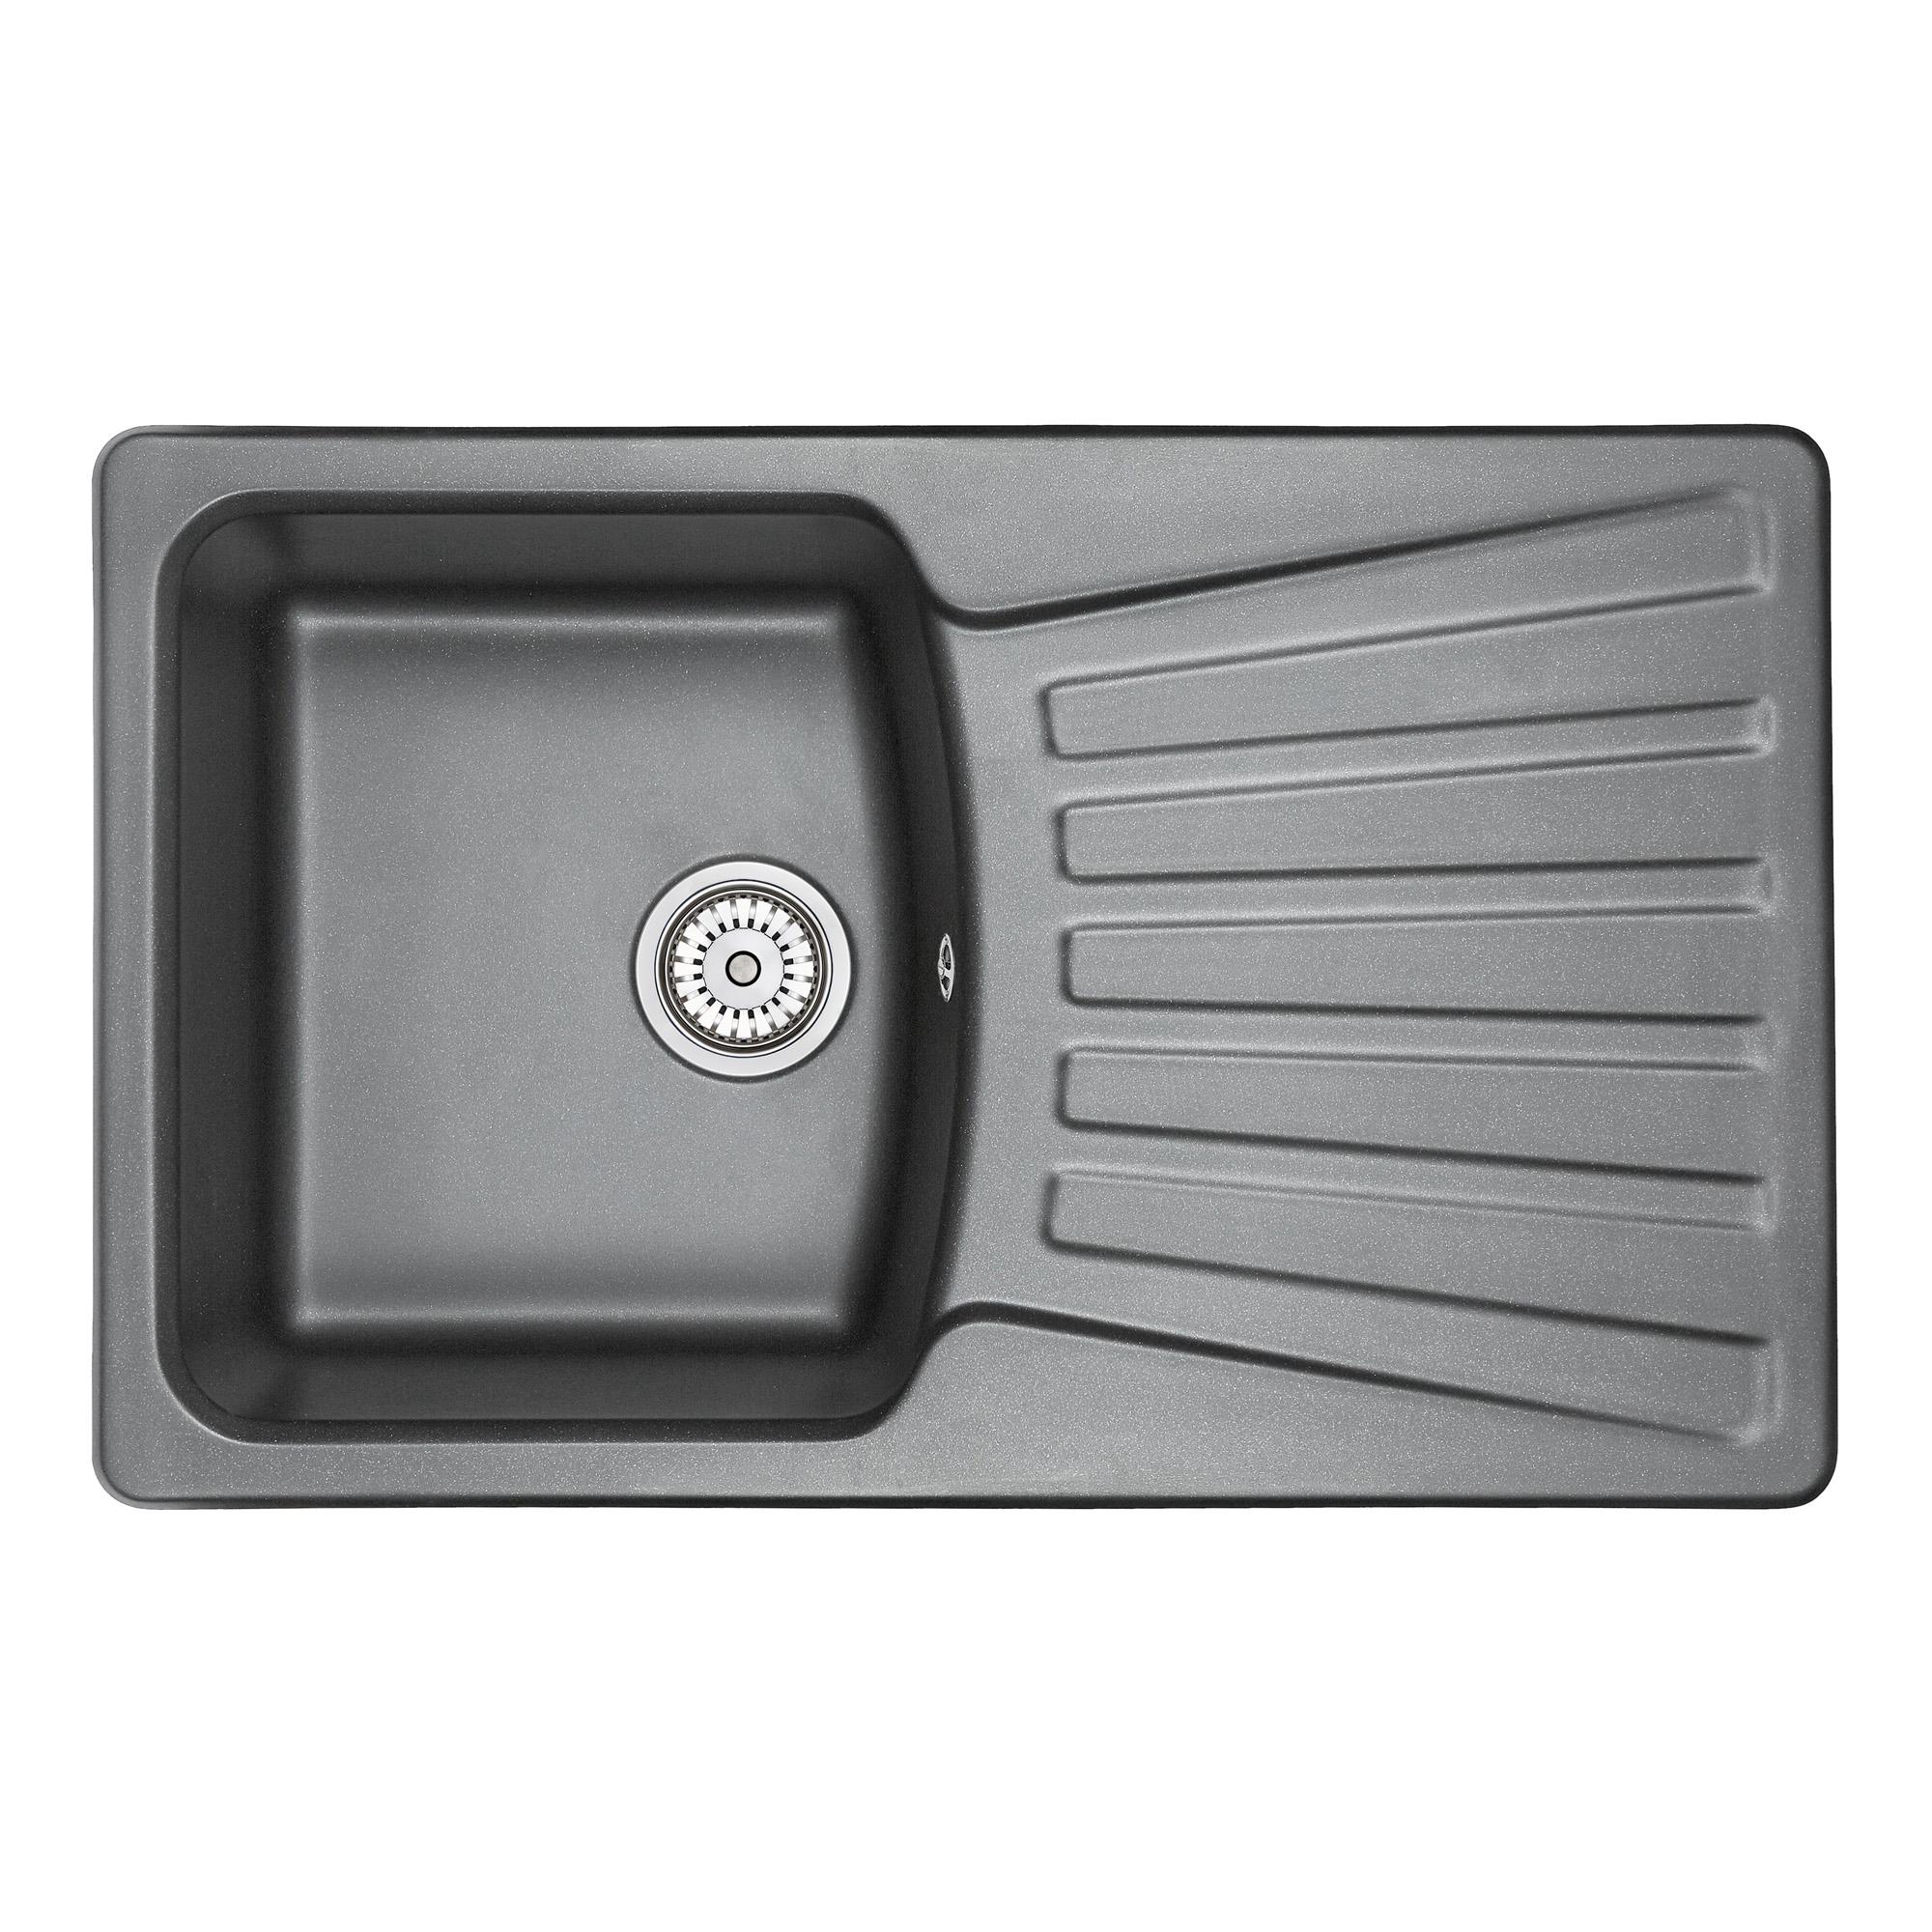 Кухонная мойка Granula GR-8001 790х500 шварц посуда кухонная